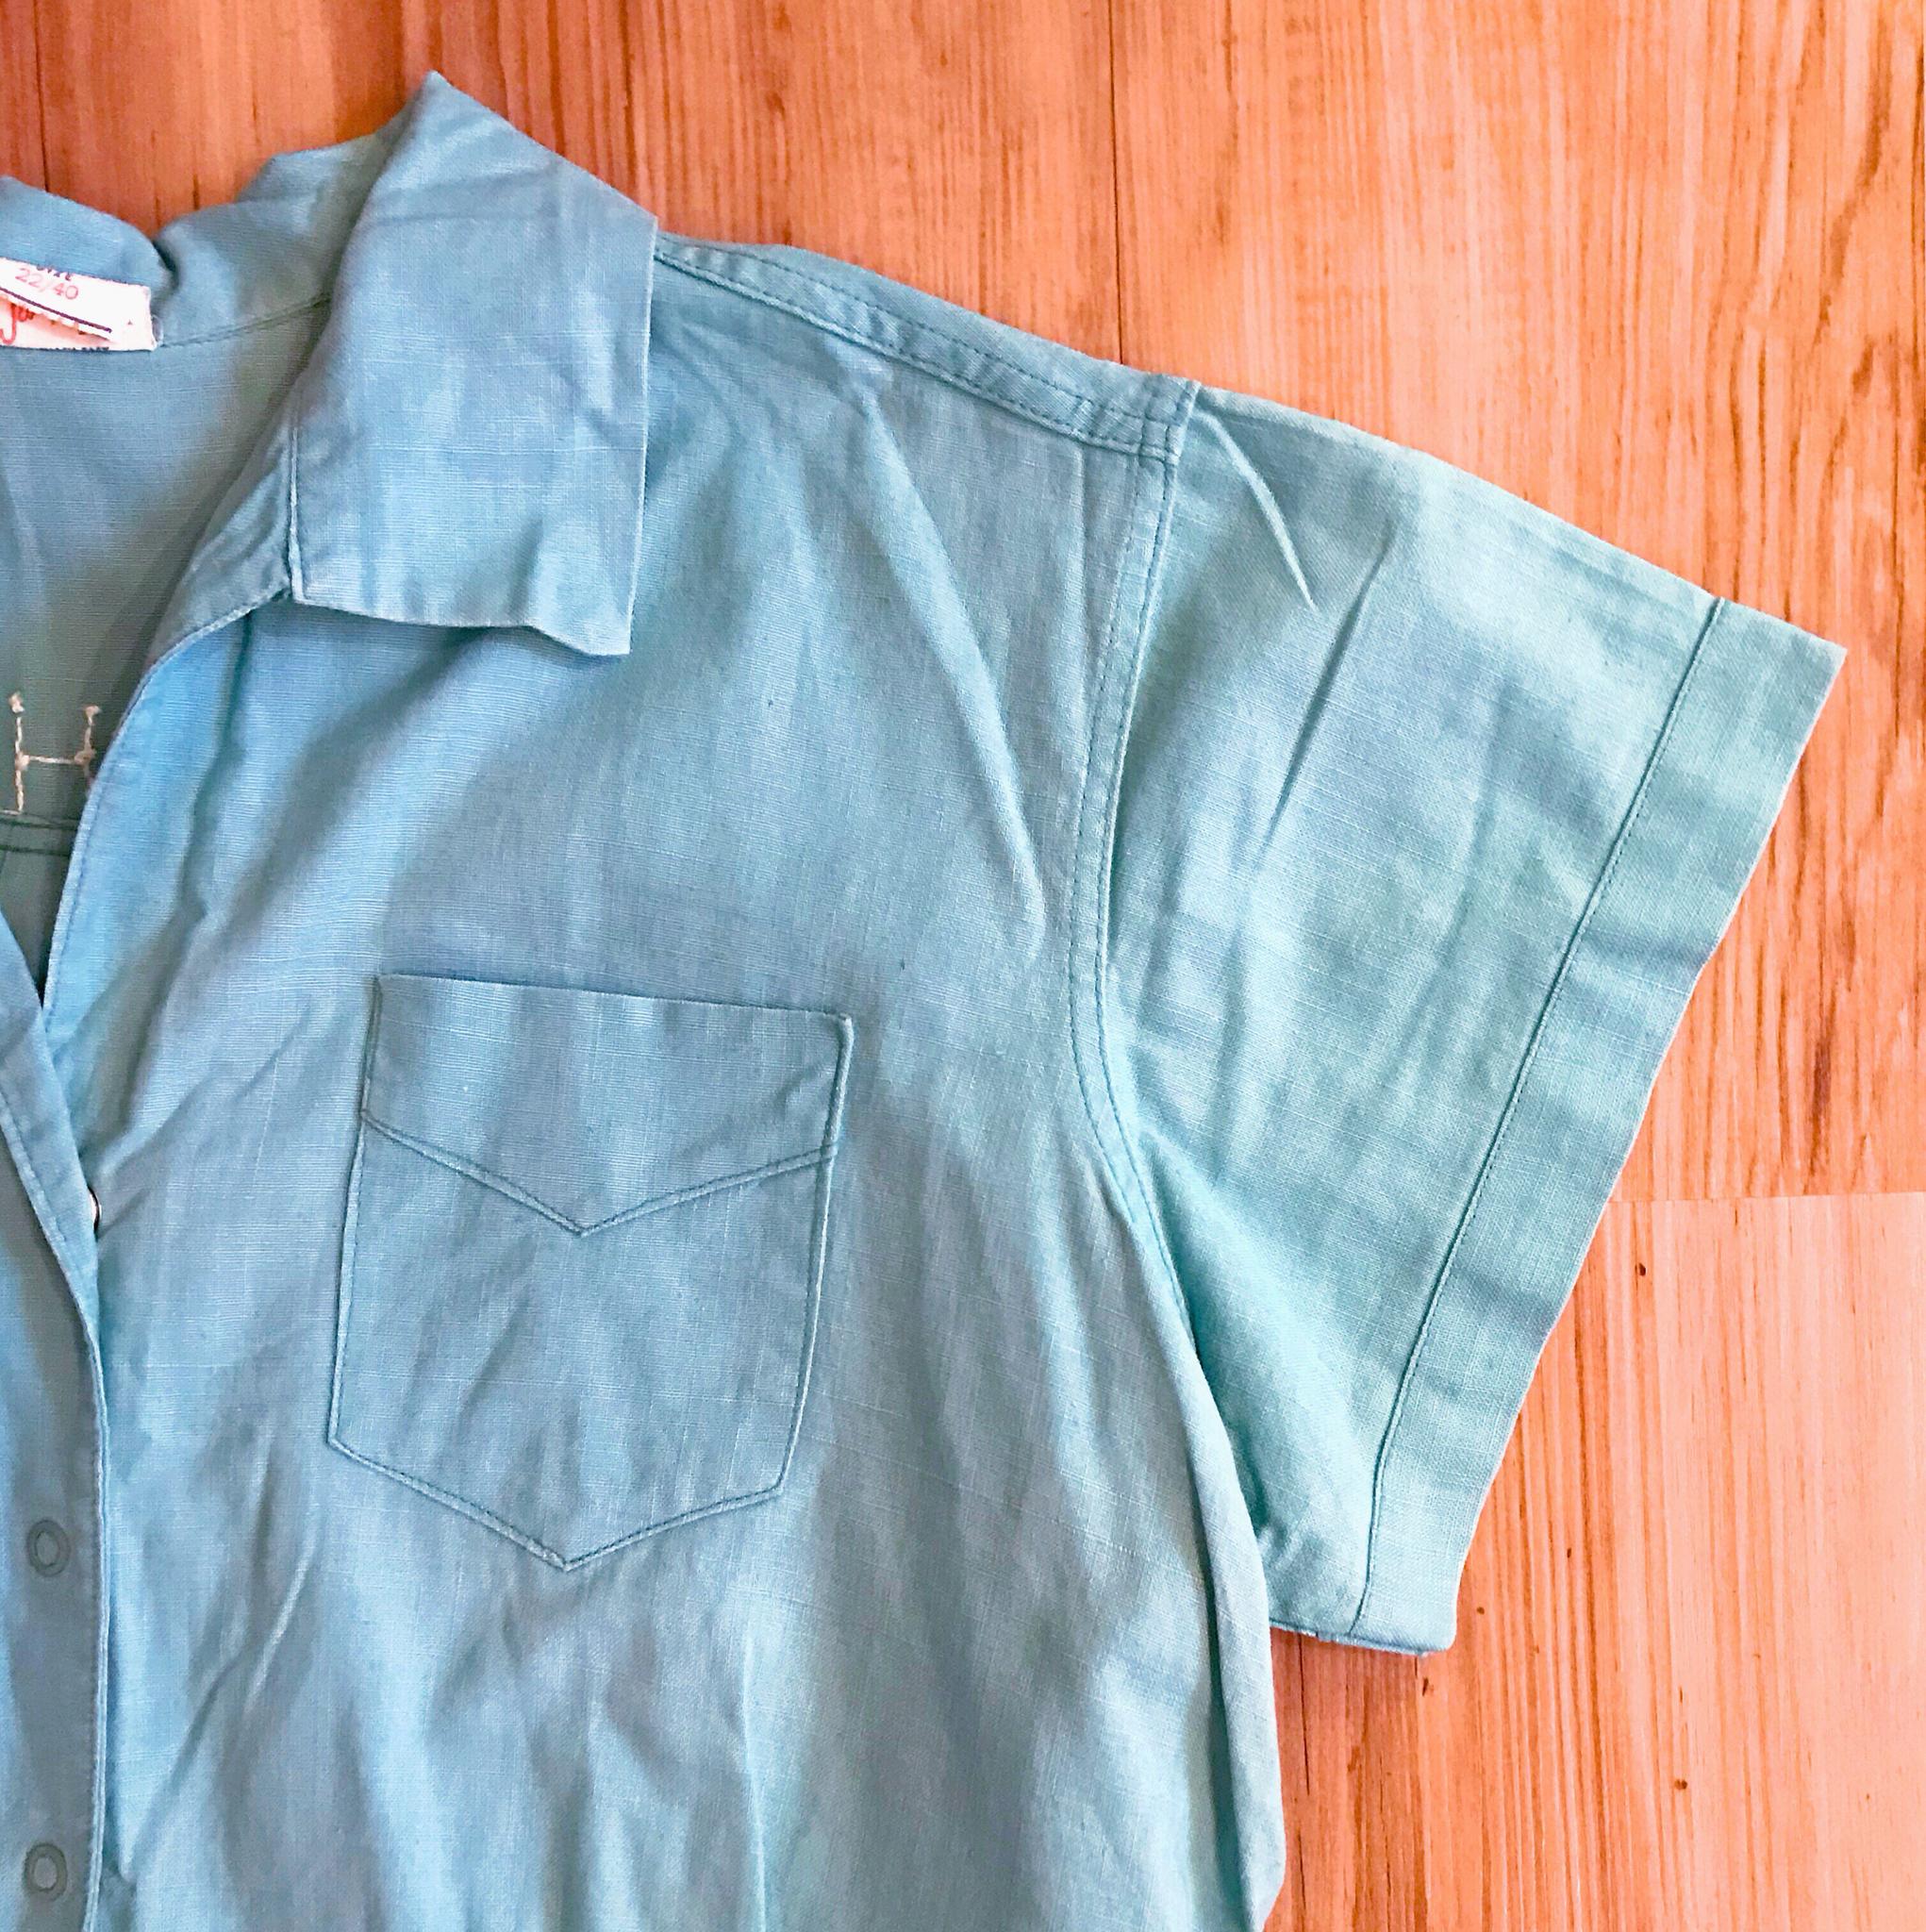 1950s Bright Blue Gym Uniform